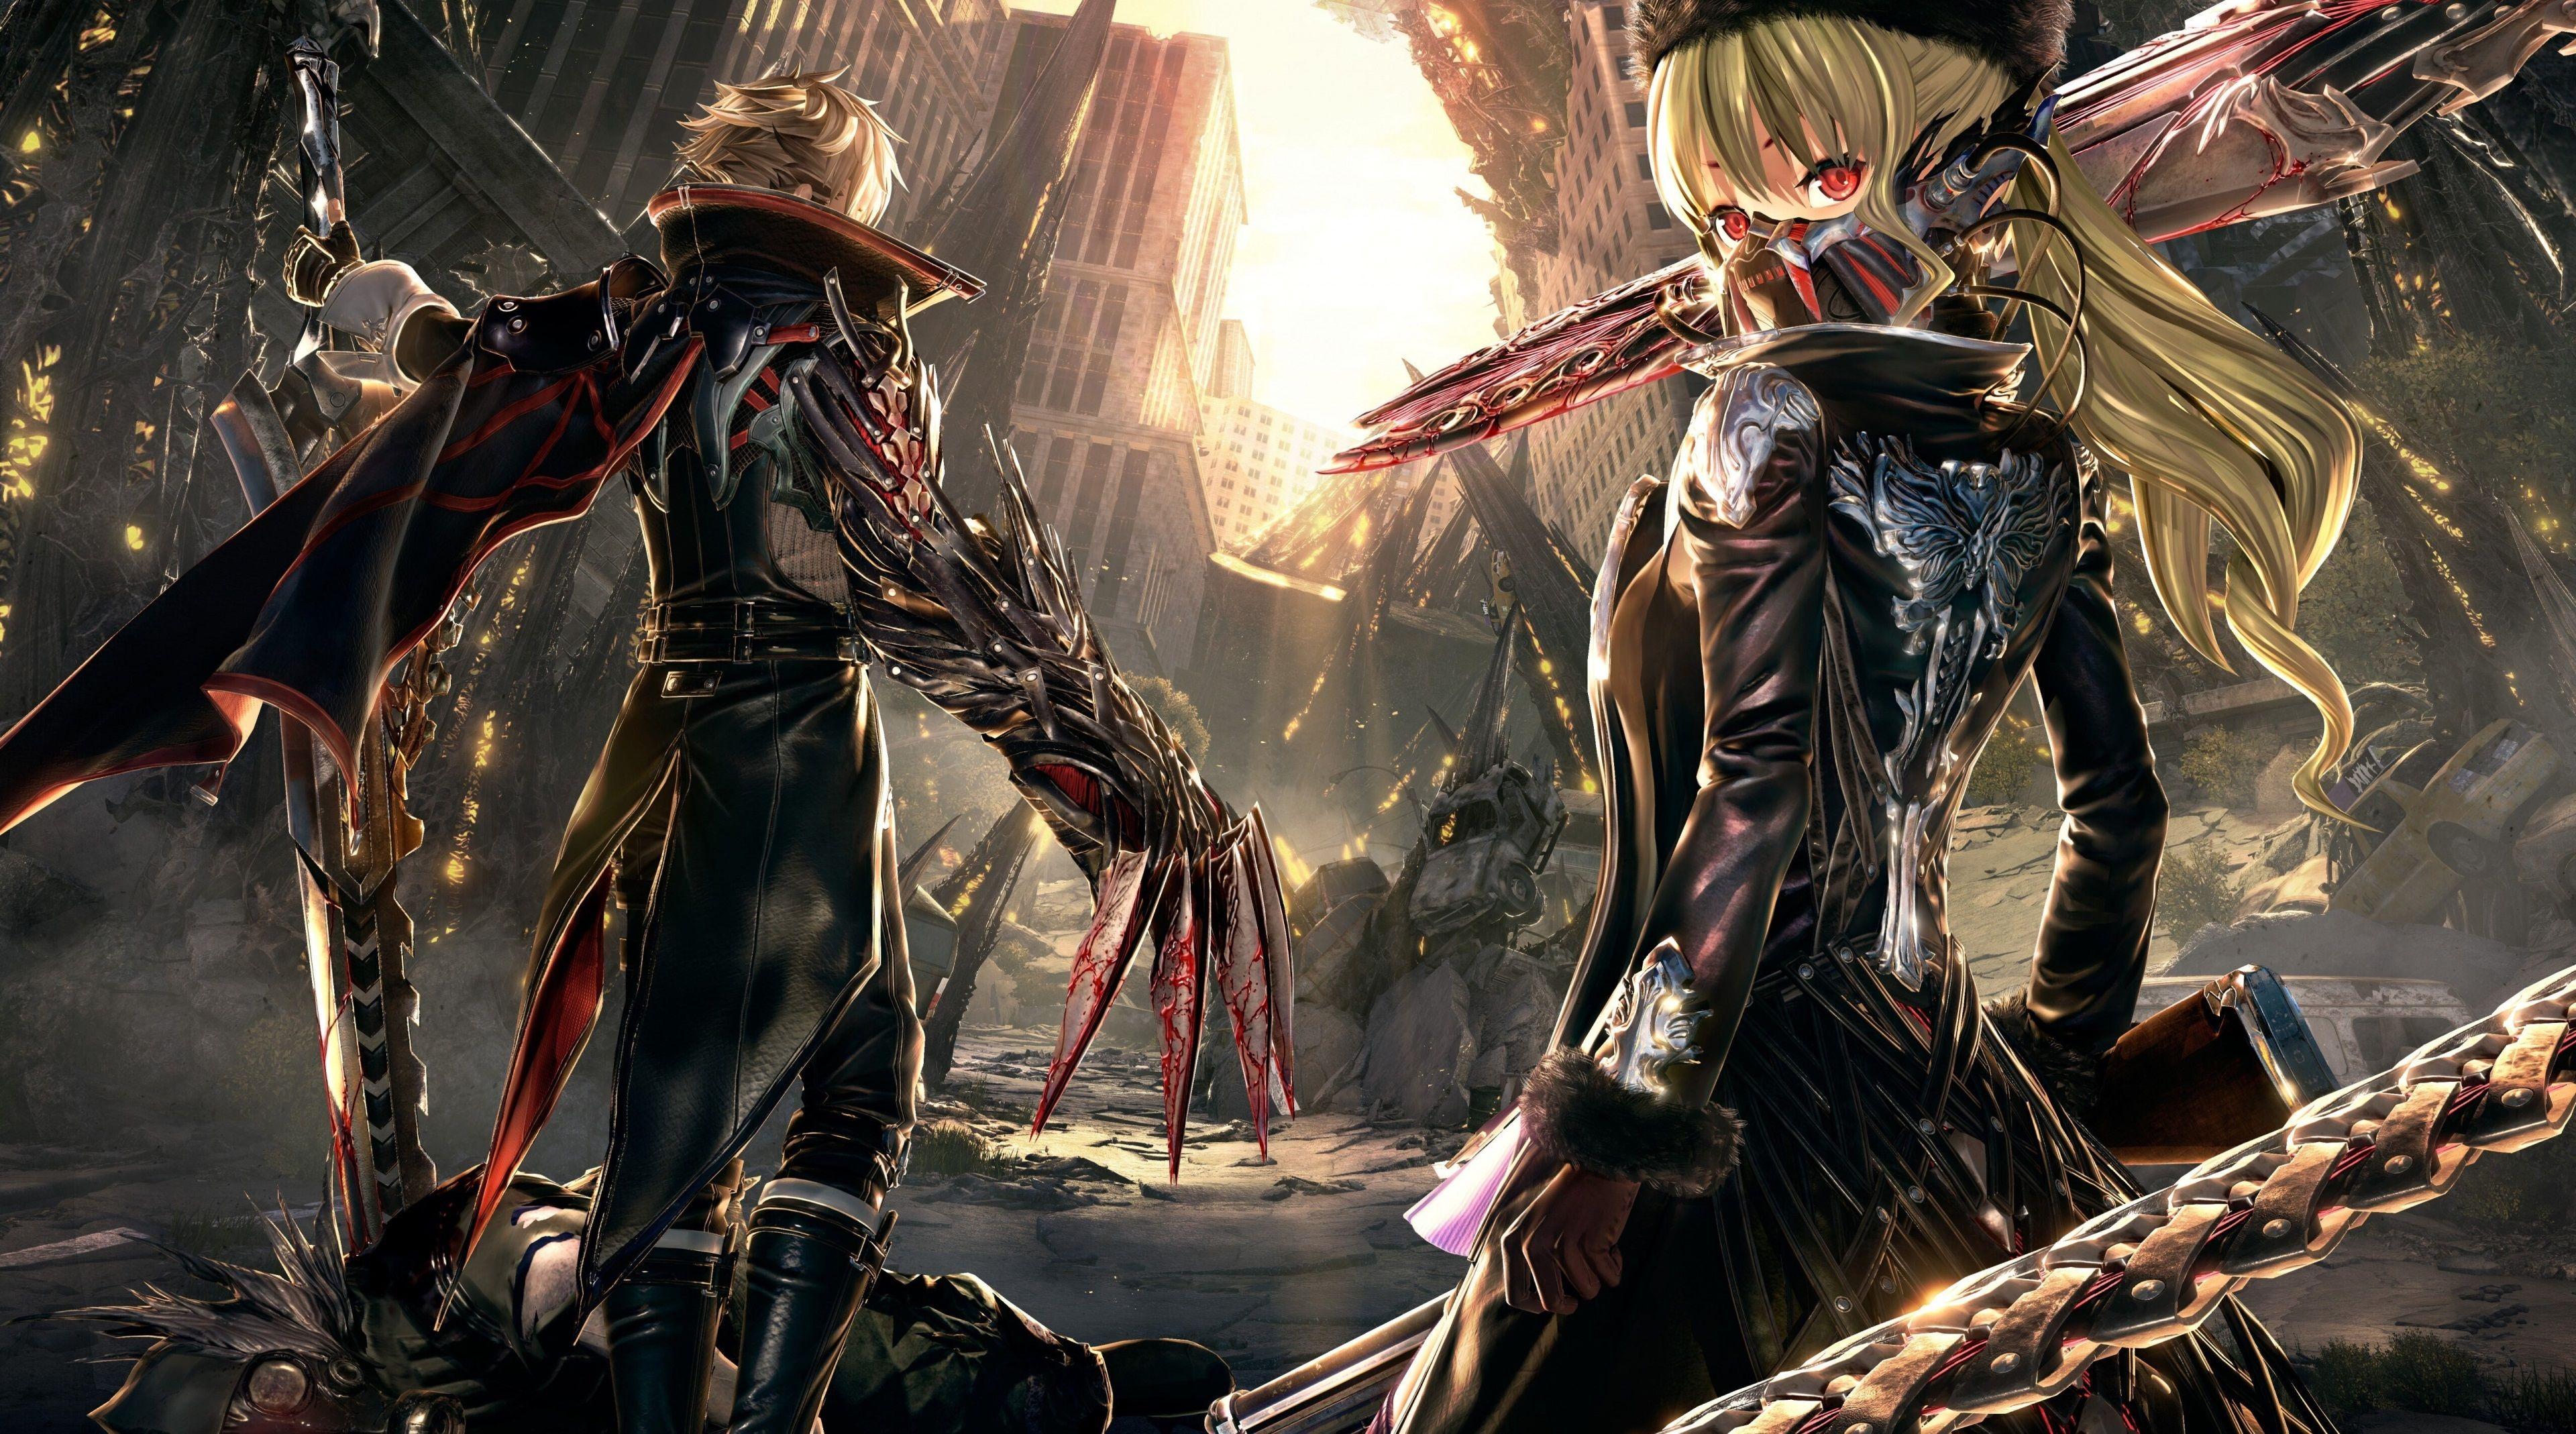 3840x2138 Code Vein 4k Best Hd Wallpaper For Pc Free Download Bandai Namco Entertainment Dark Souls Video Game Cheats